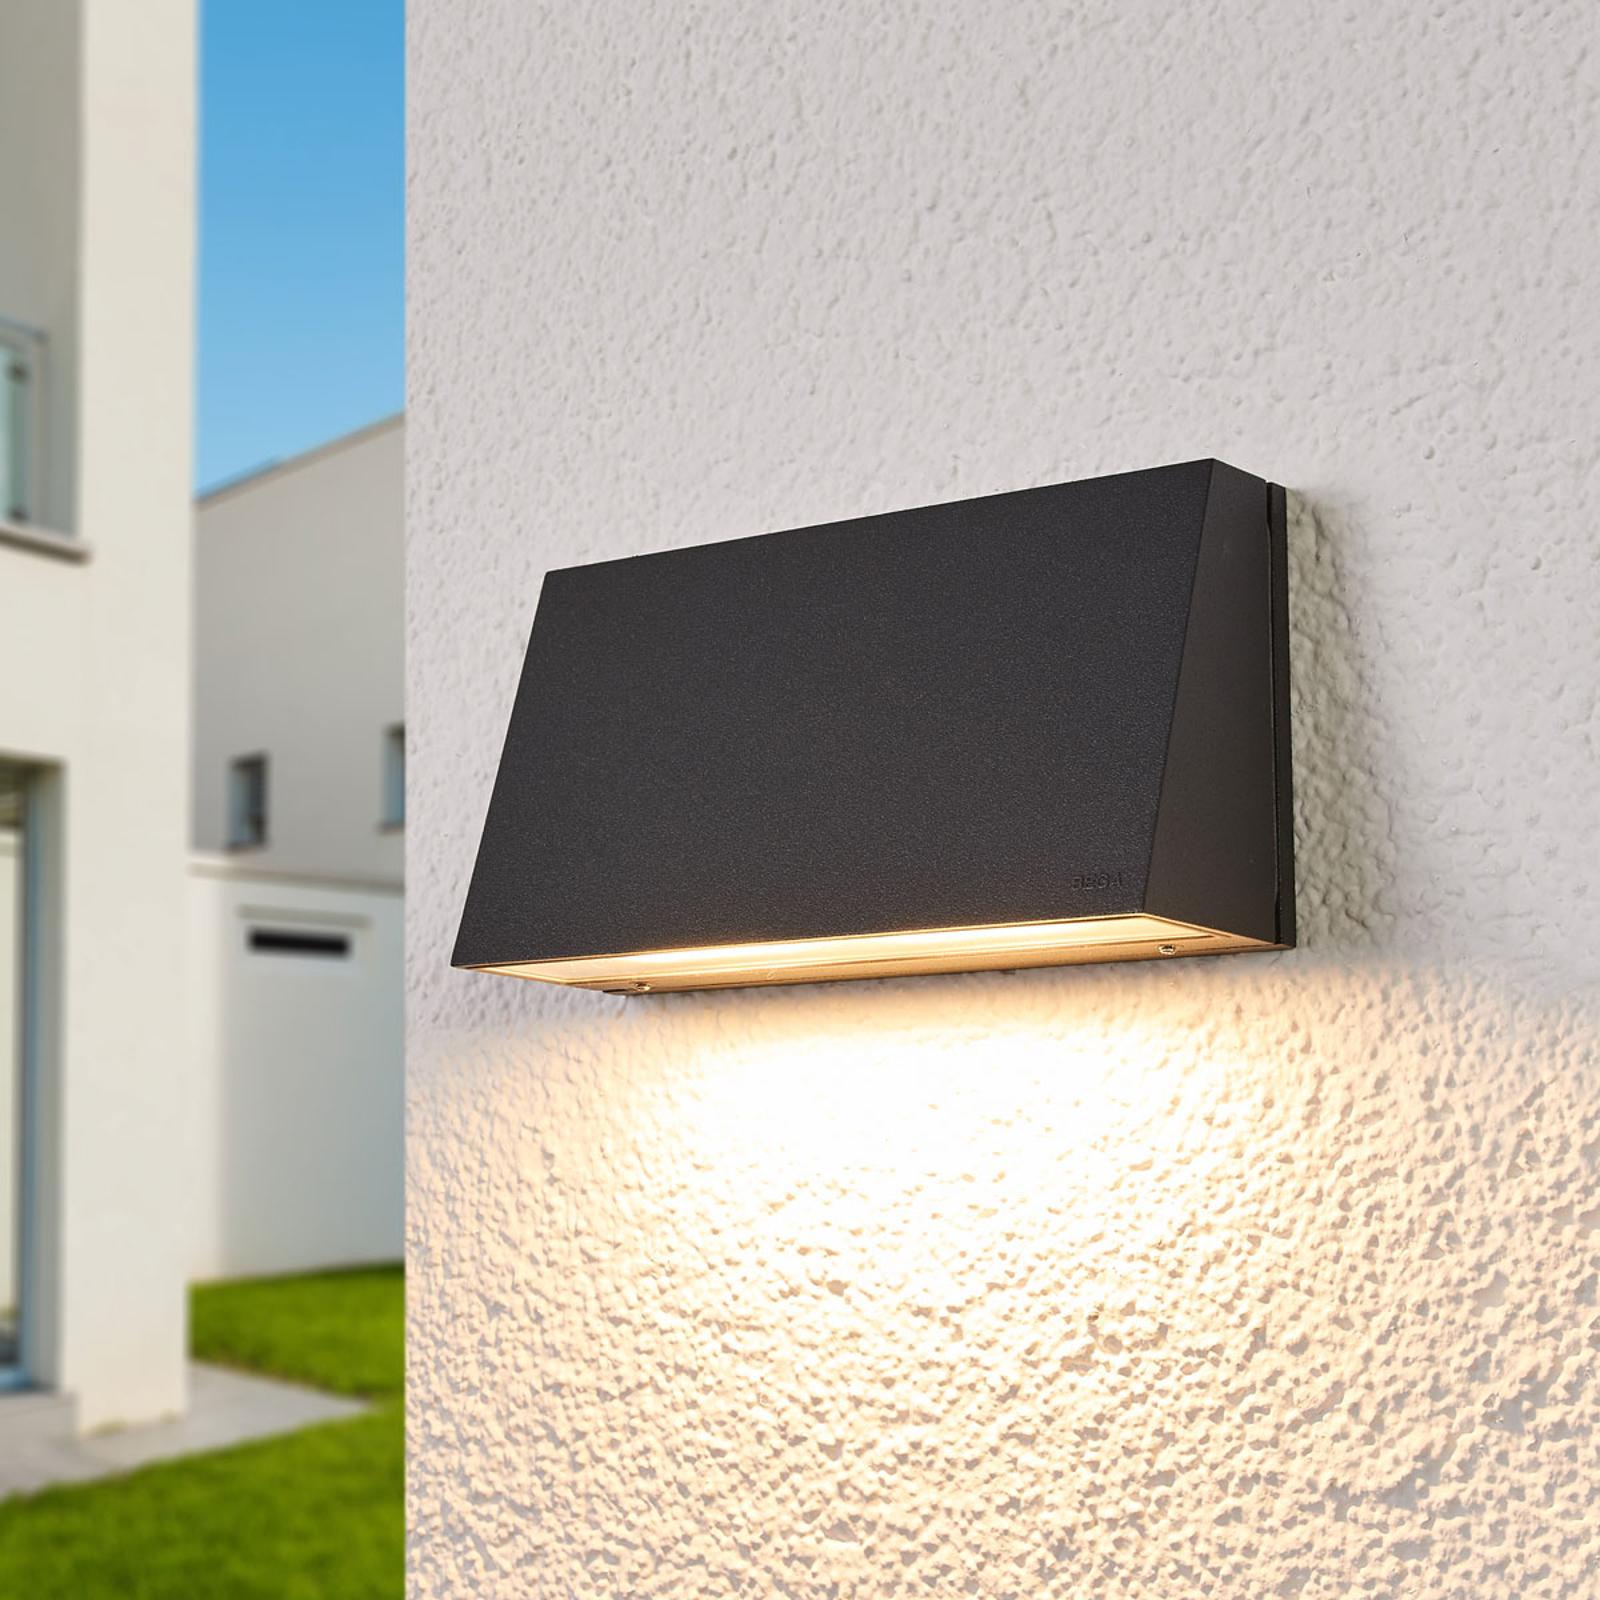 BEGA 22261K3 Außenwandlampe grafit 3.000K 17,5cm